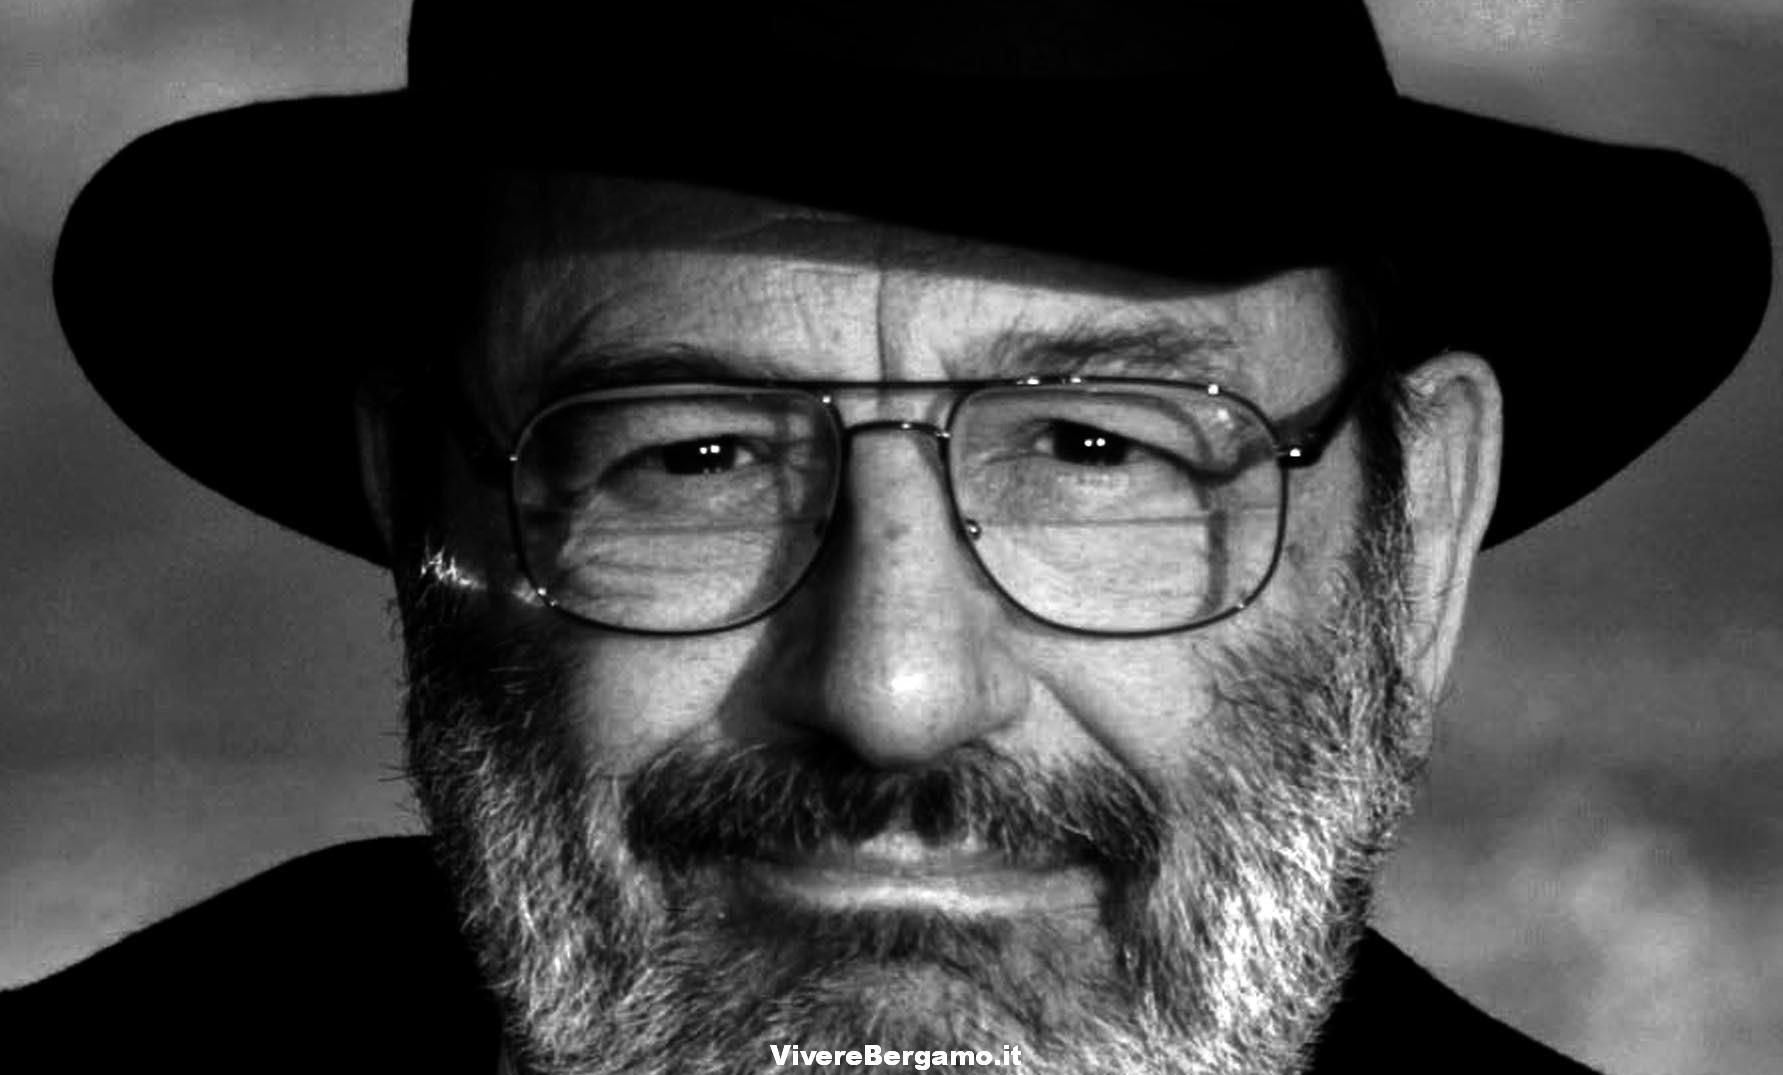 Umberto Eco Vivere Bergamo